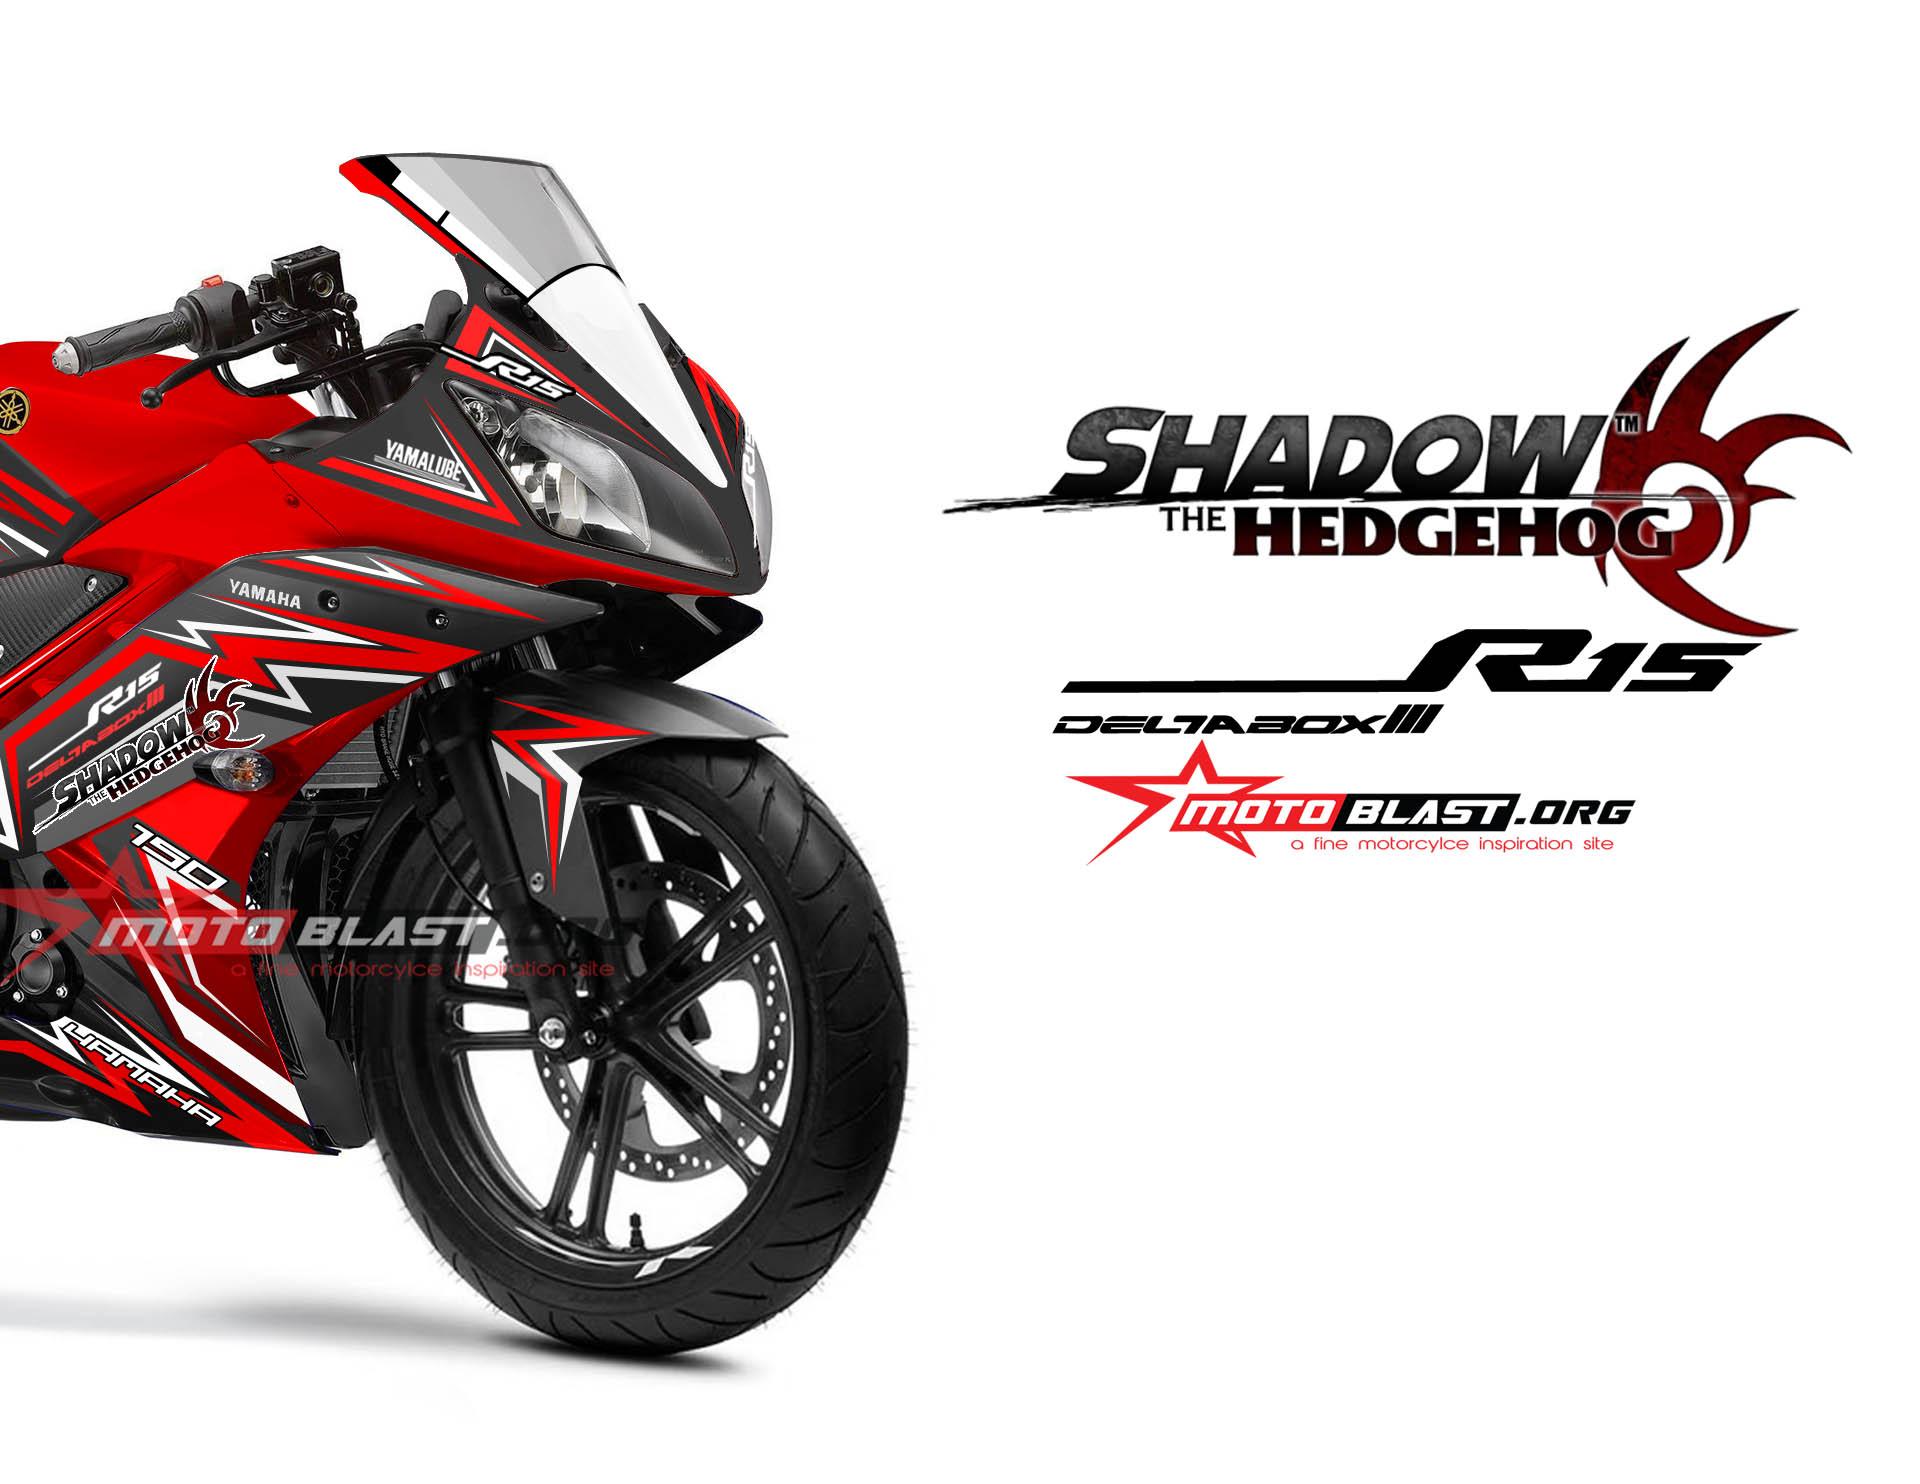 R15 RED SHADOW HEDGEHOG motoblast